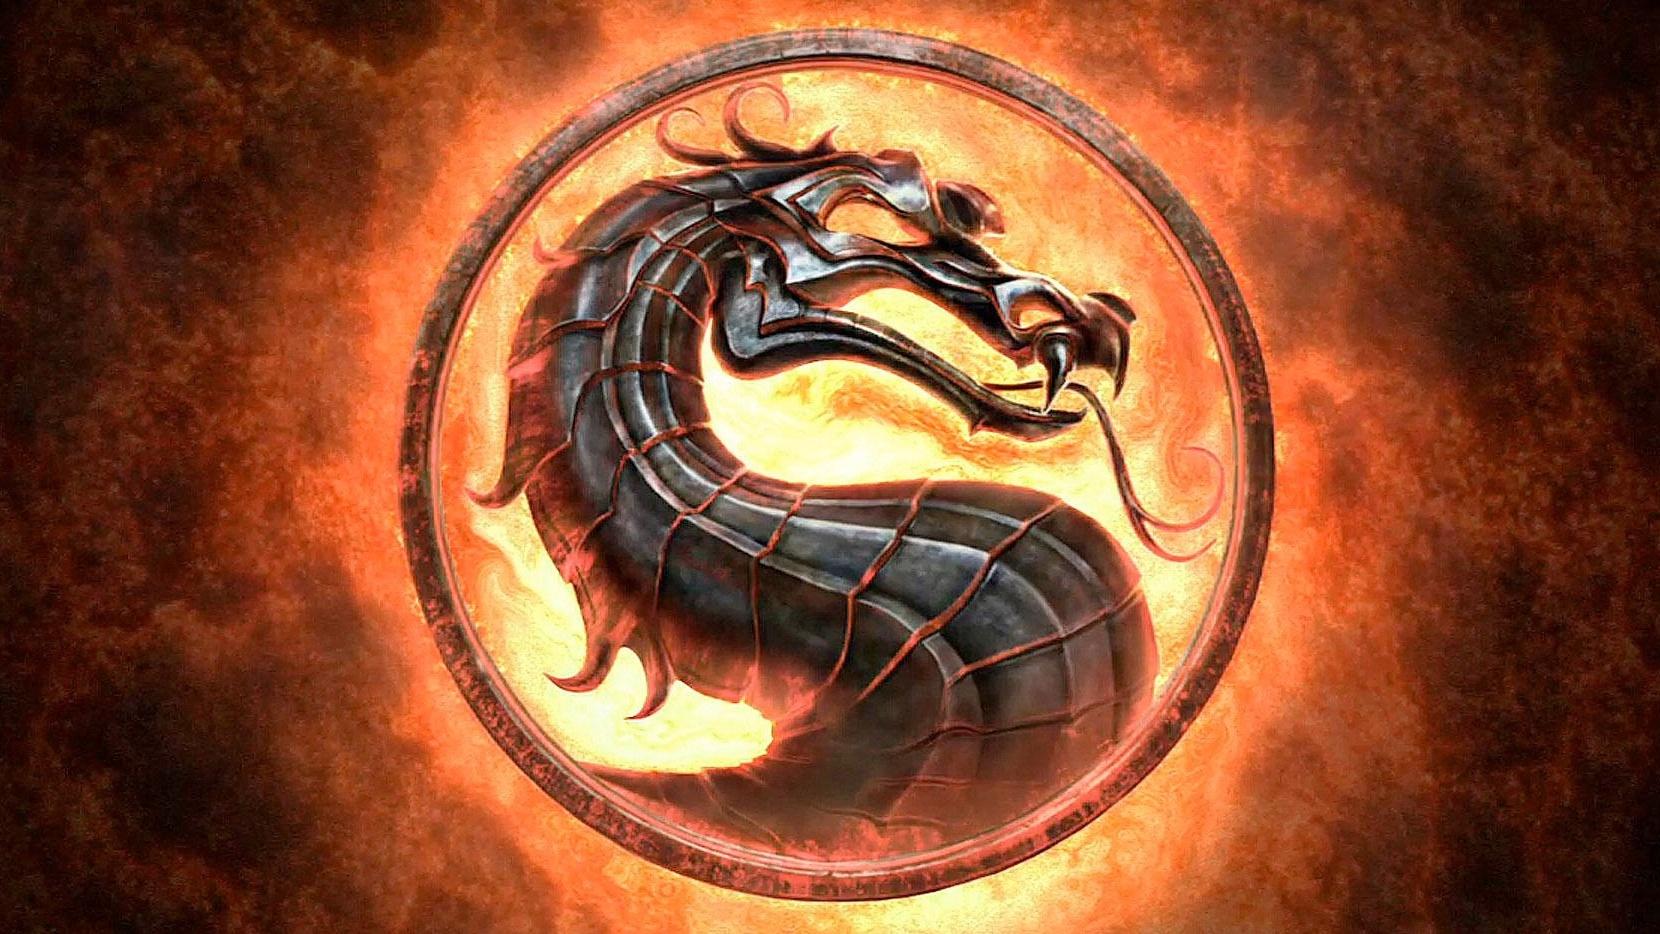 «Они несдерживали себя». Фаталити вэкранизации Mortal Kombat будут жестокими